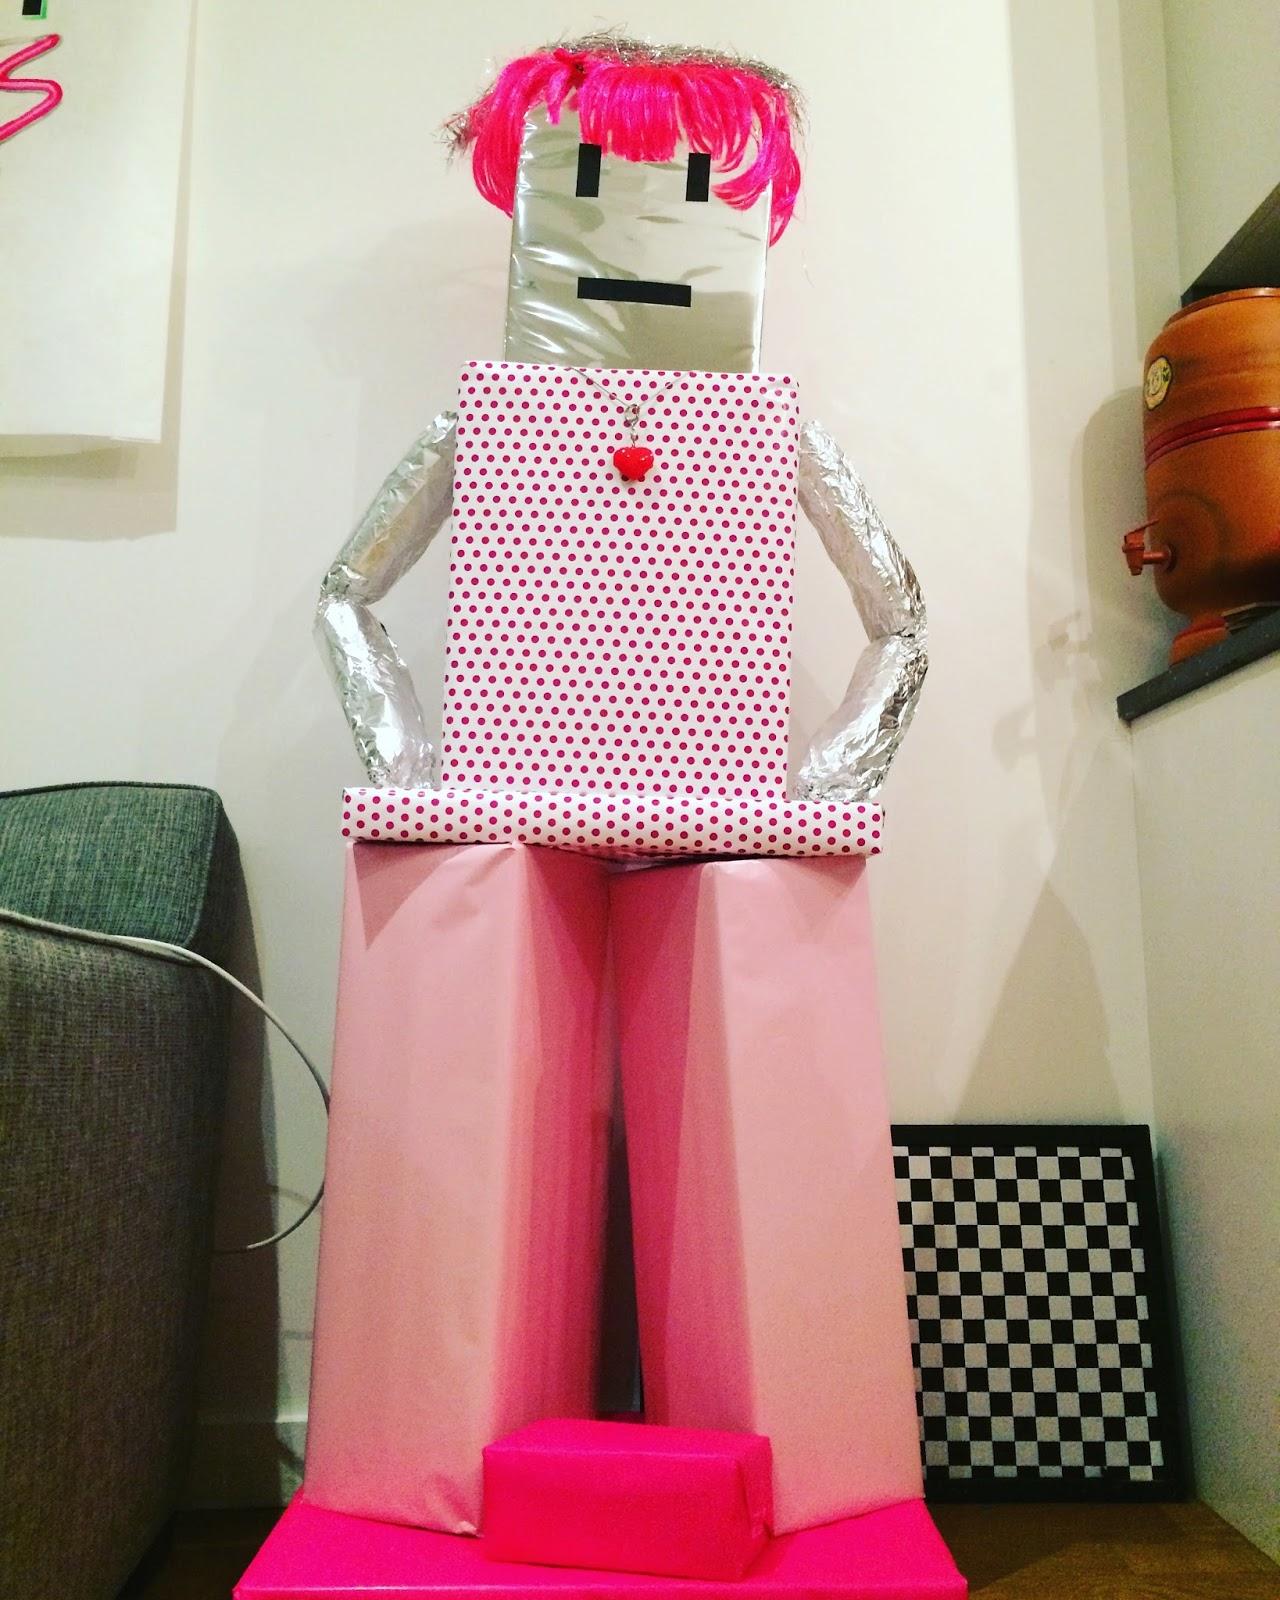 Robot Made Of Birthday Presents